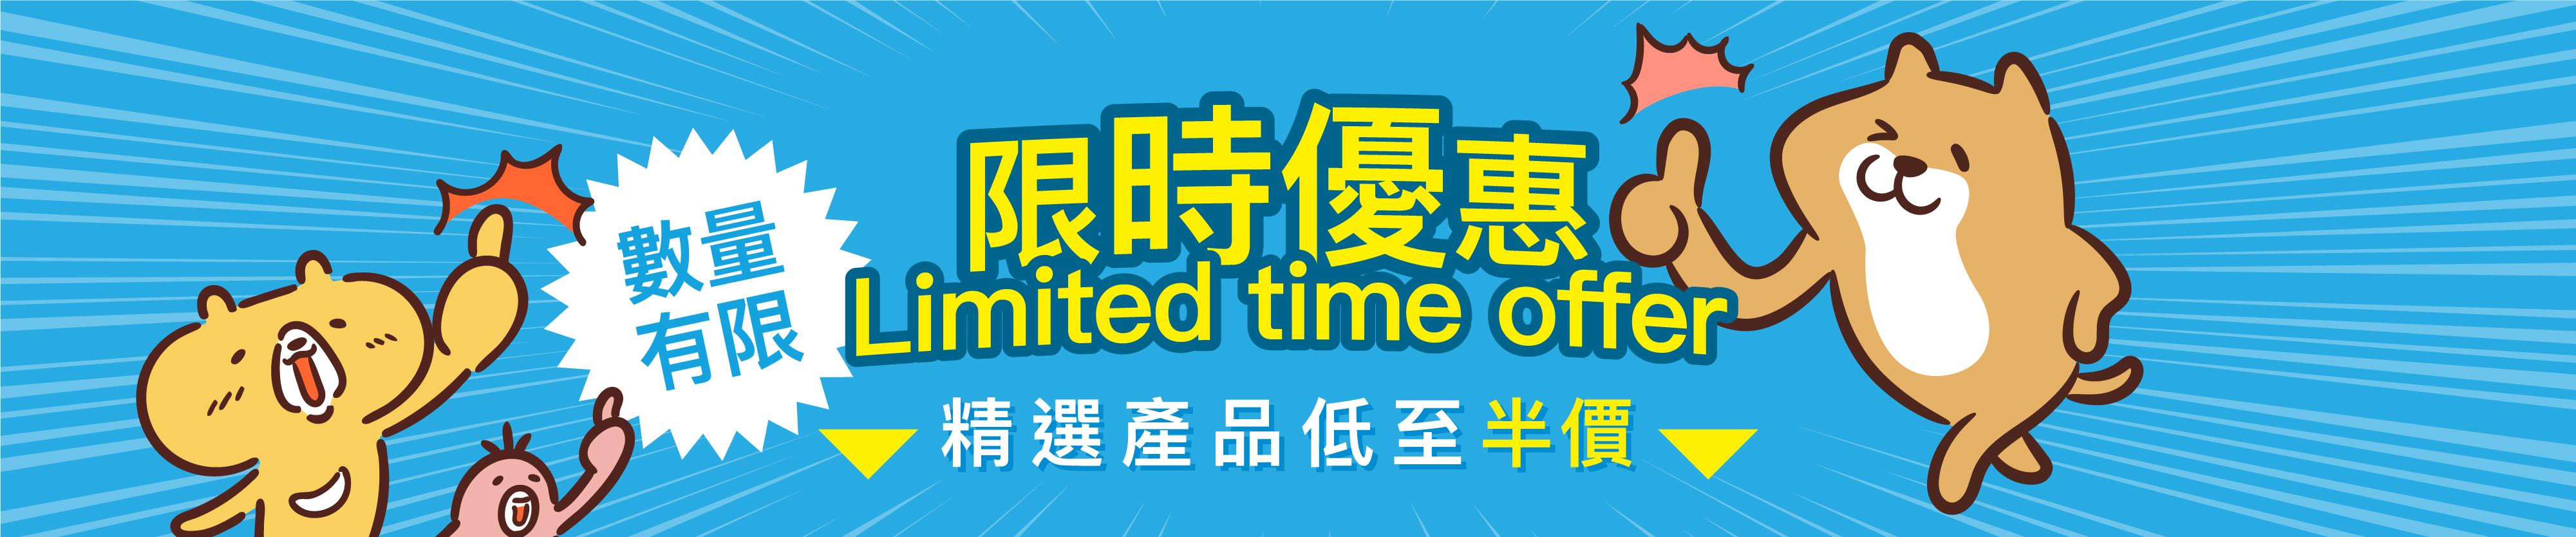 限時優惠 Limited time offer 精選產品低至半價